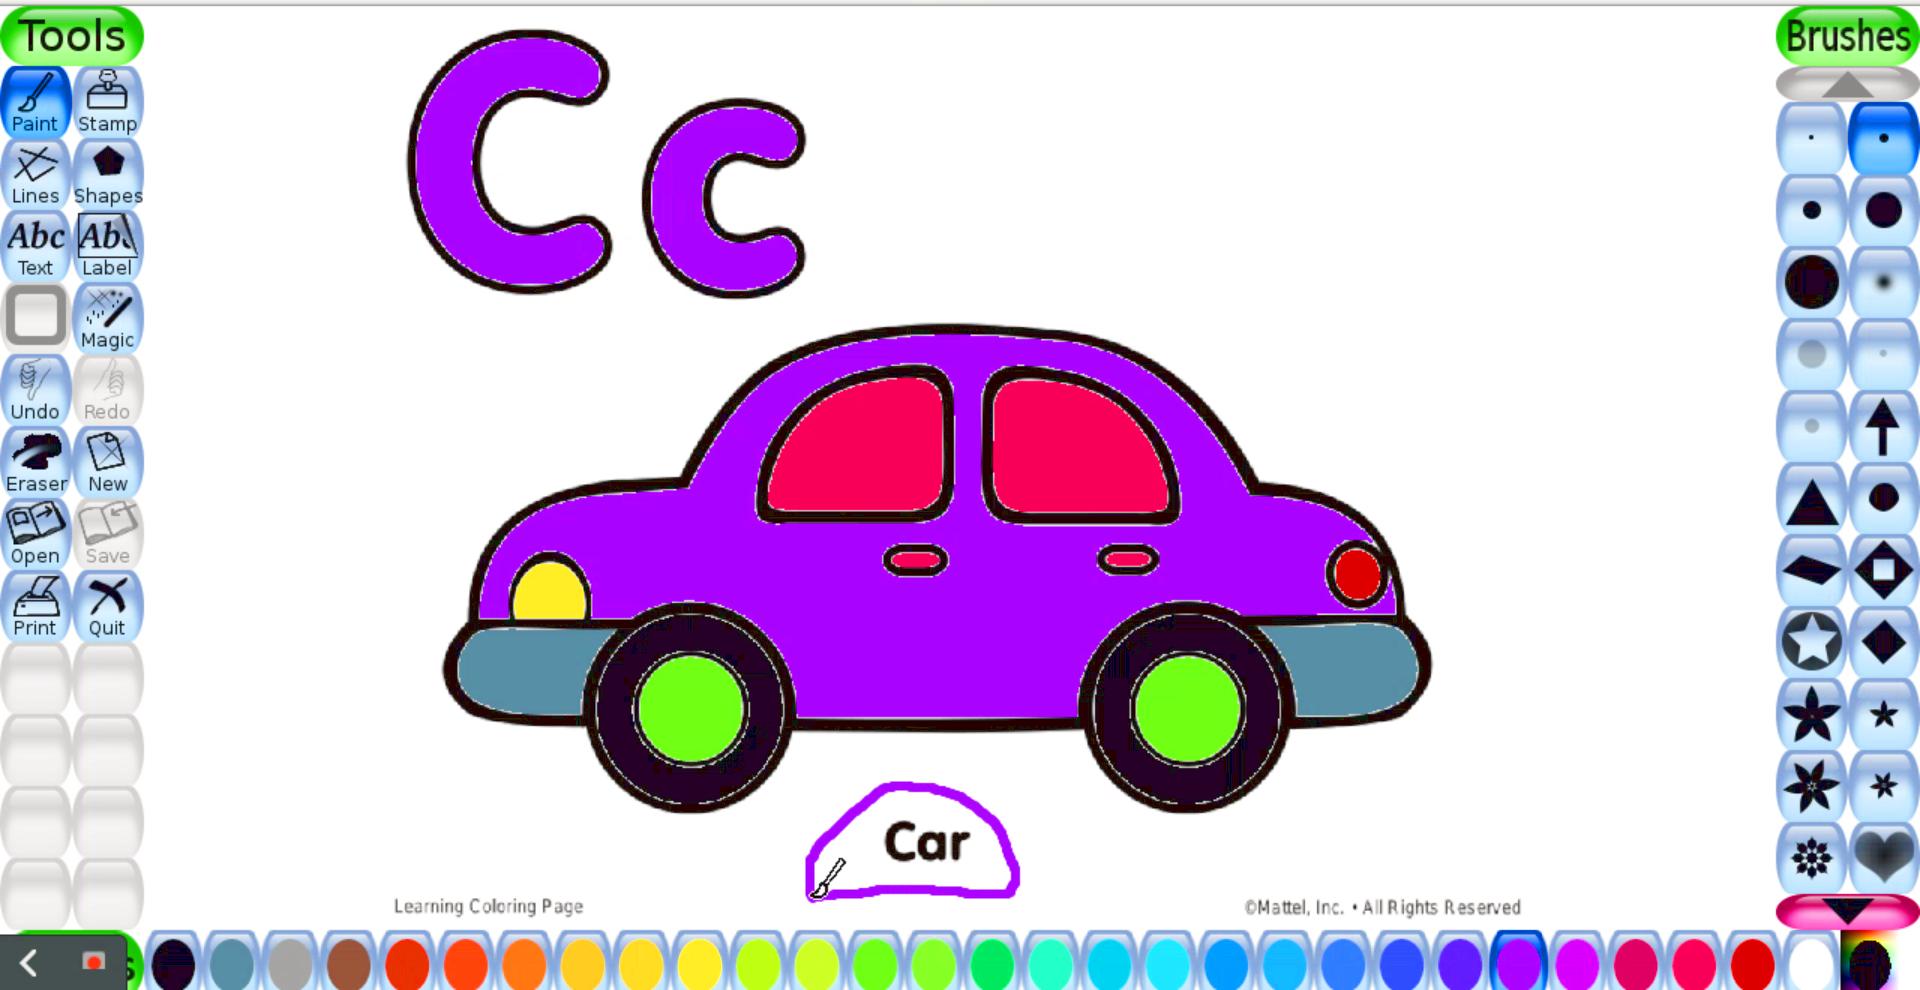 Alphabet Abc Coloring Pages Coloring Book Coloring Letter C Coloring A Car Alphabet Abc Alphabet Abc C Abc Coloring Abc Coloring Pages Learning Colors